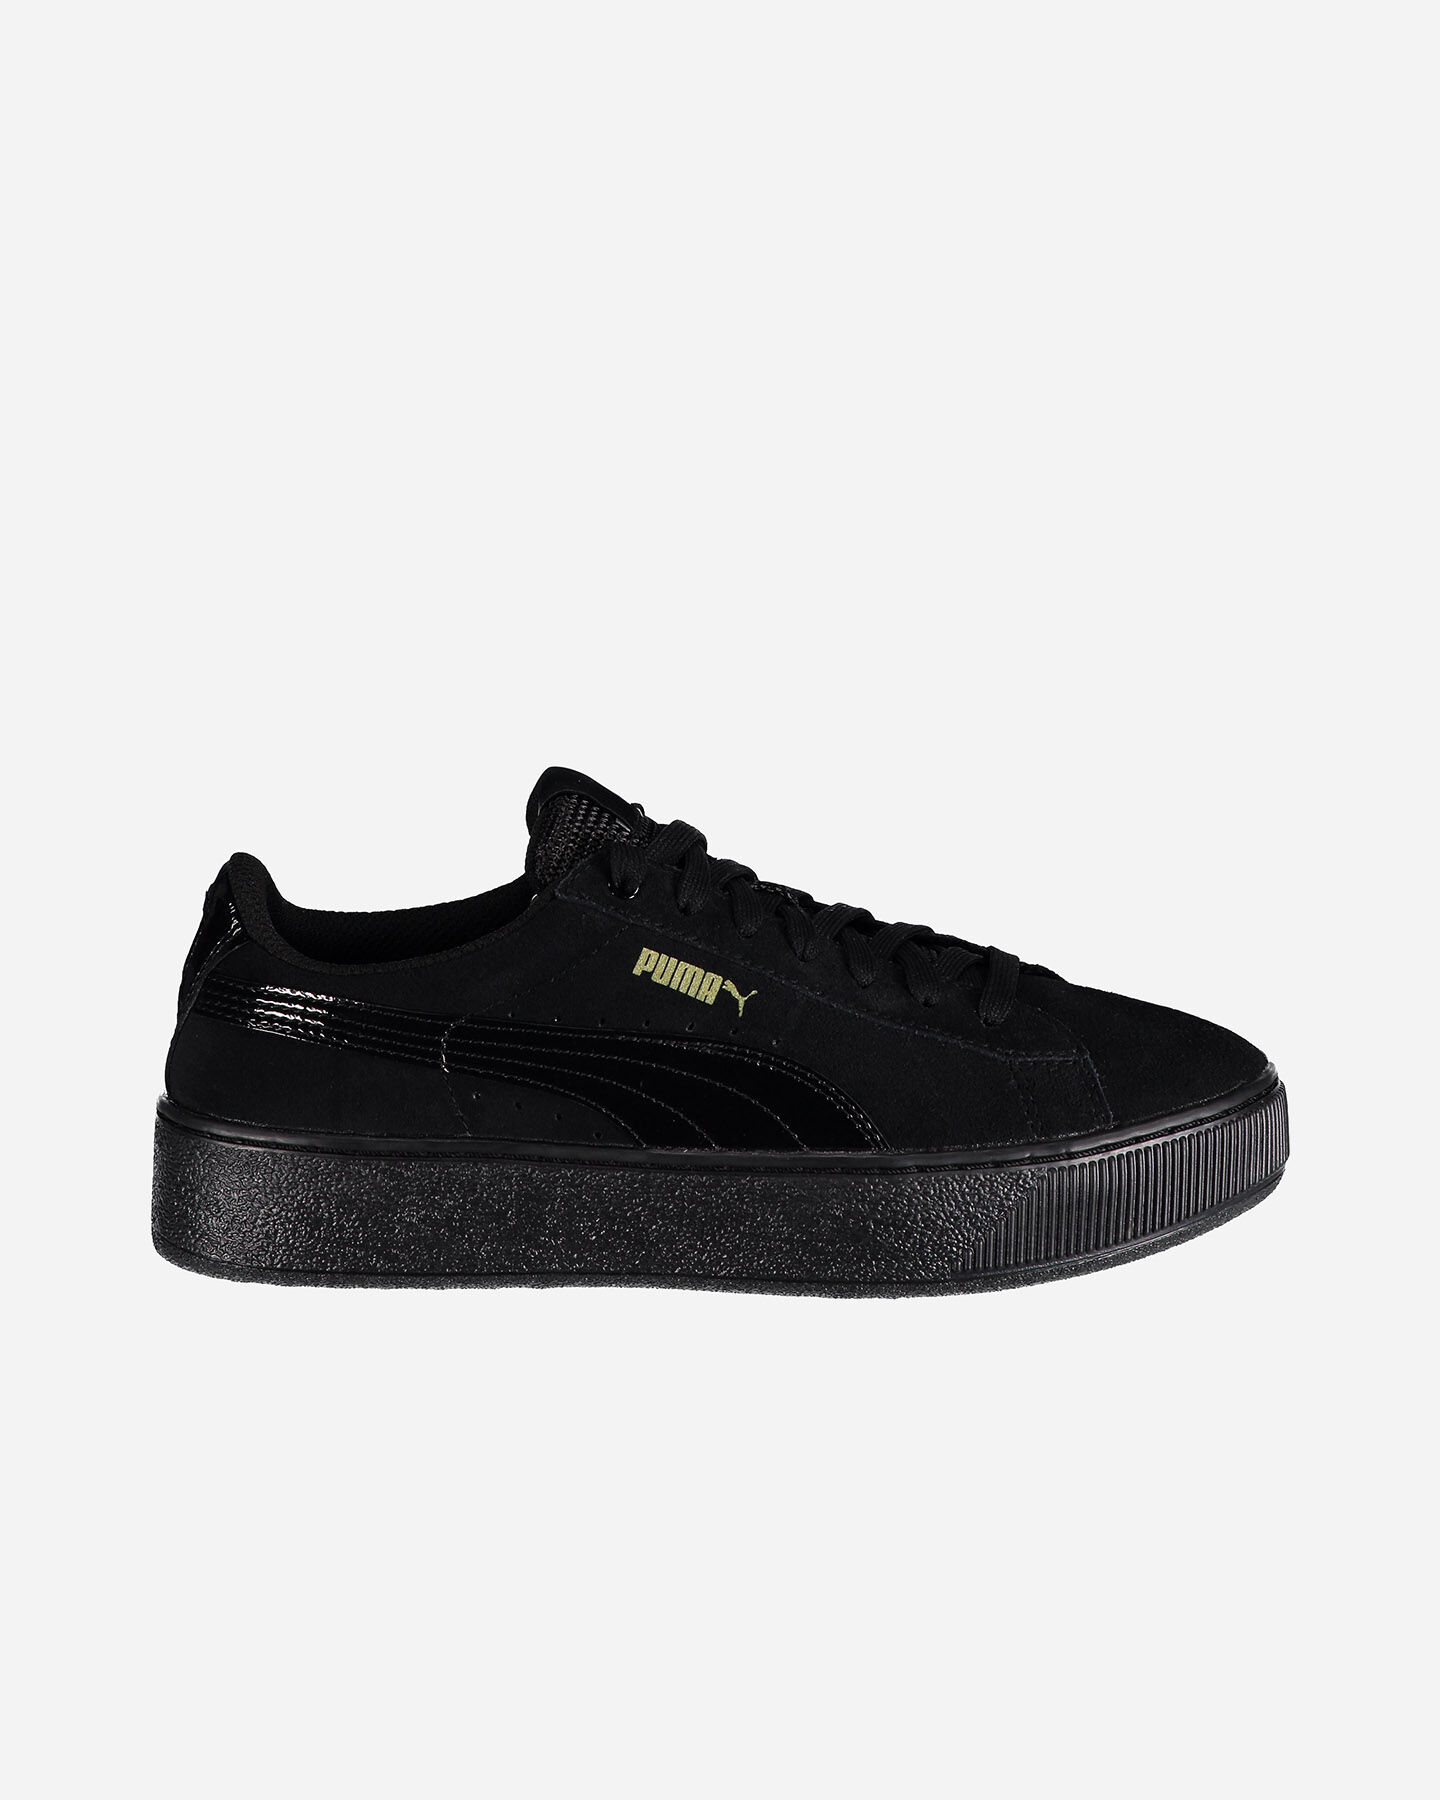 363287 Cisalfa Puma Vikky Su Sport W 001 Scarpe Platform Sneakers nqfXTPwF